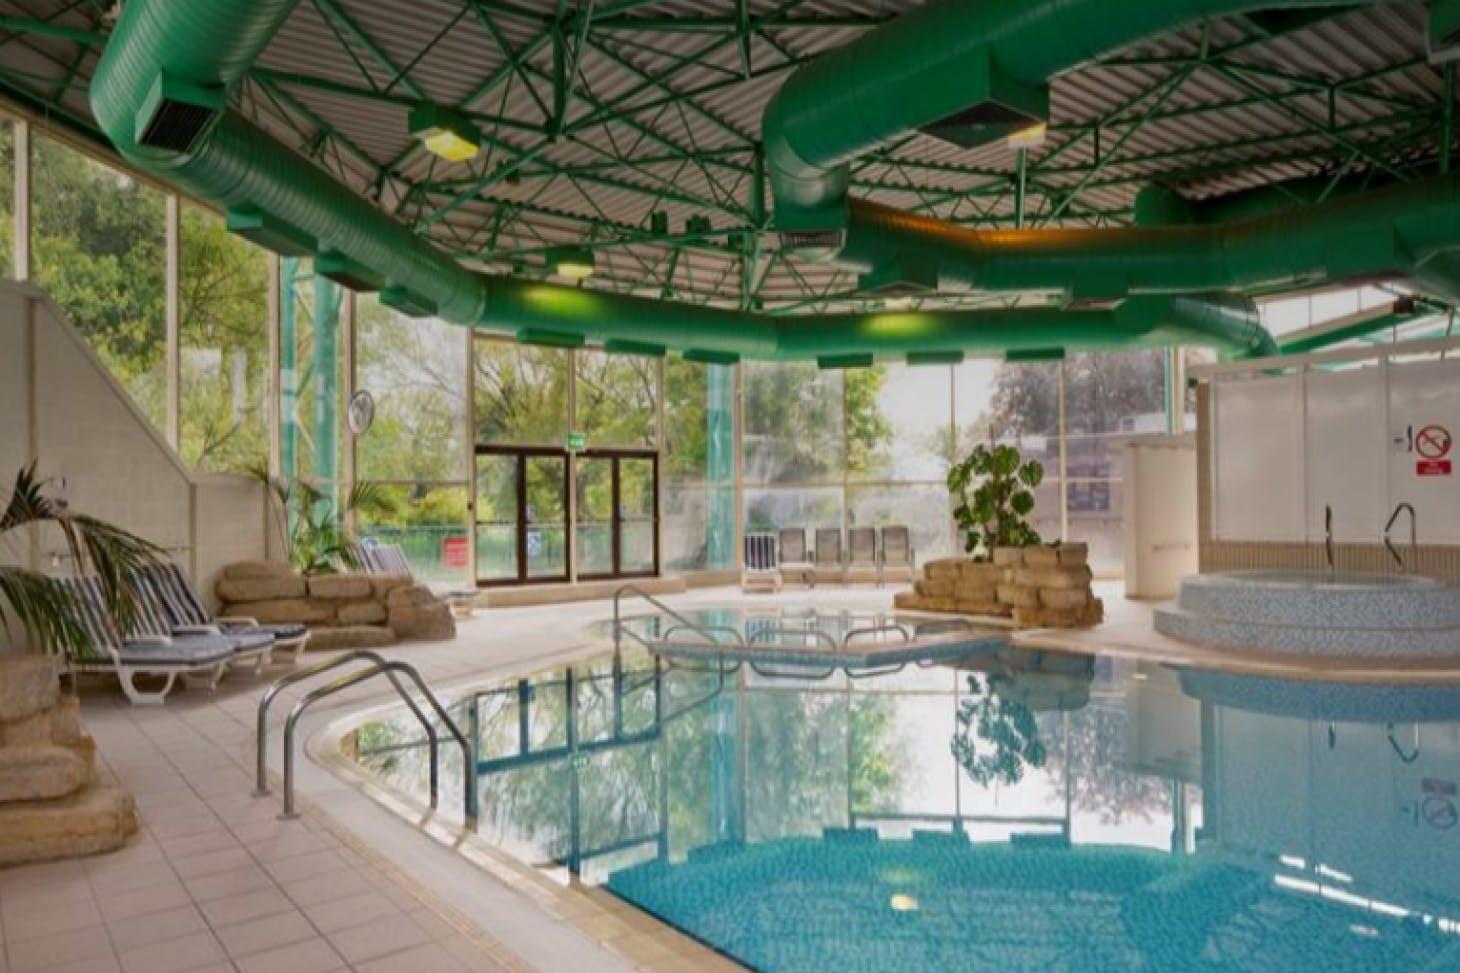 Spirit Health Club Maidenhead Indoor swimming pool